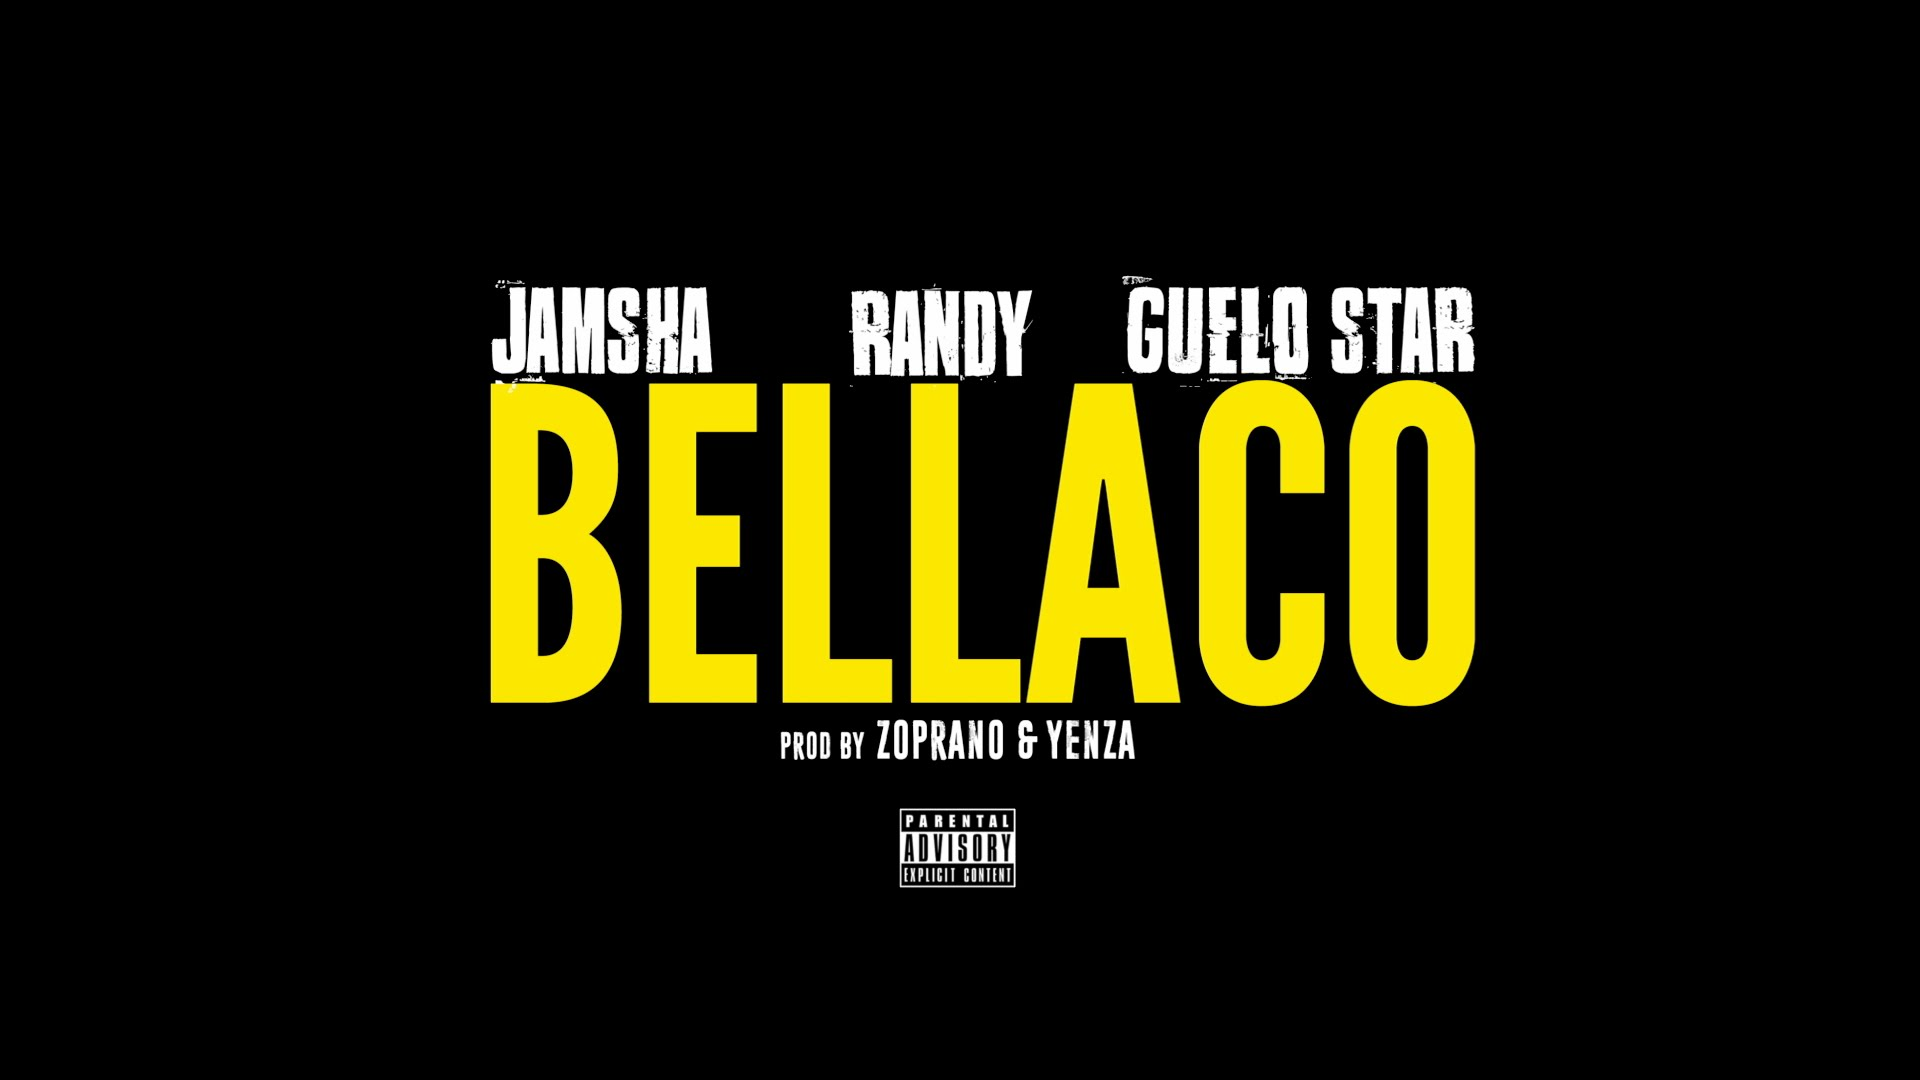 jamsha ft randy guelo star bella - Jamsha Ft. Randy, Guelo Star - Bellaco (Video Lyric)